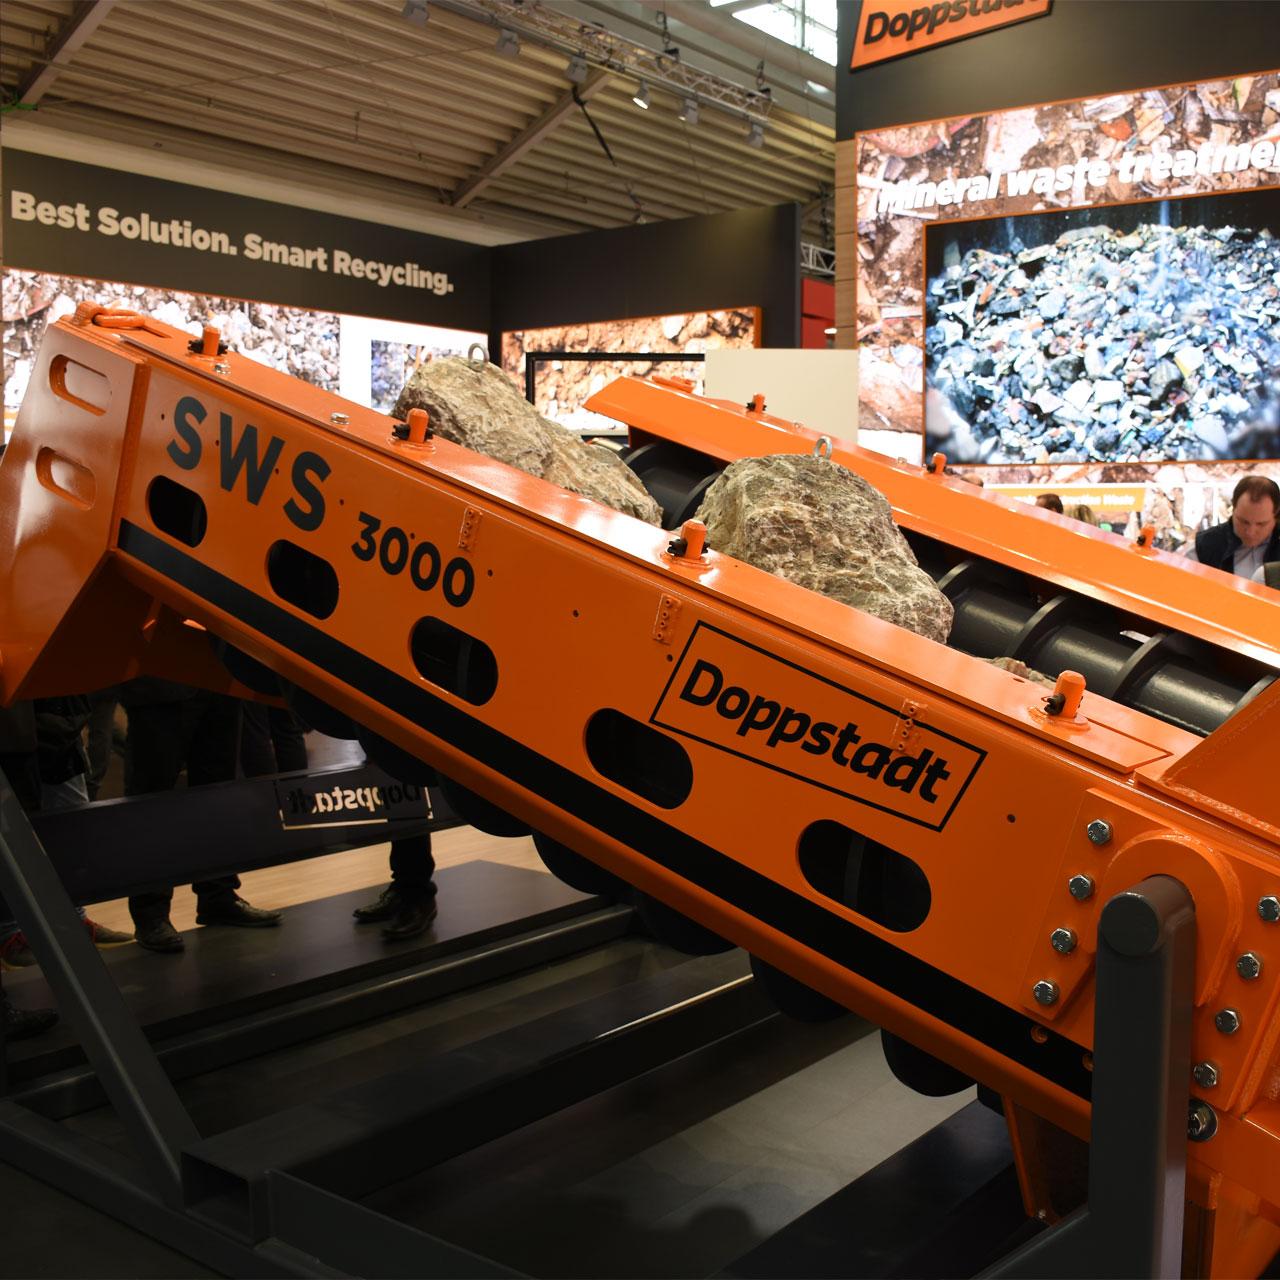 Doppstadt: Spiralwellenseparator SWS 3000